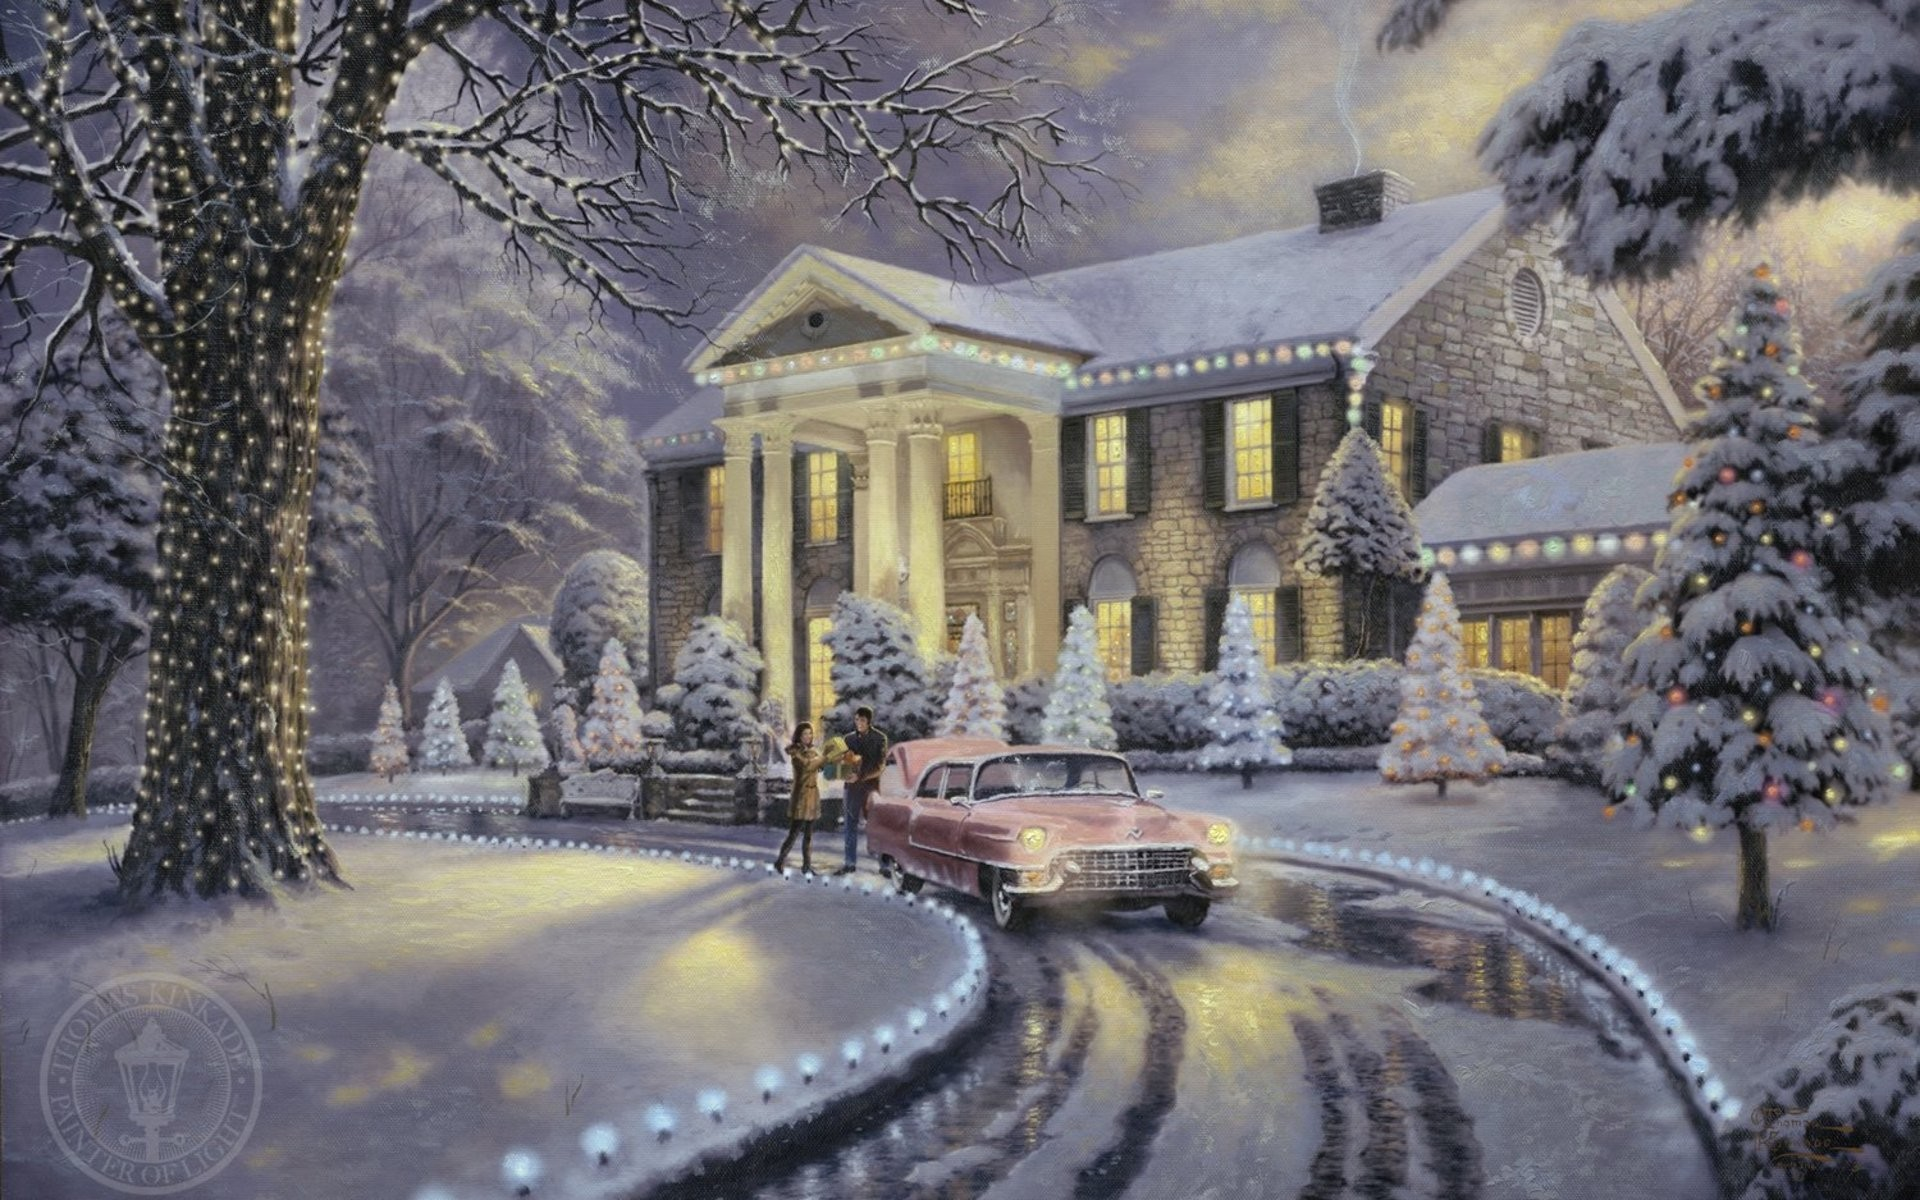 Beautiful Fall Paintings Wallpapers Thomas Kinkade Christmas Wallpapers 59 Images